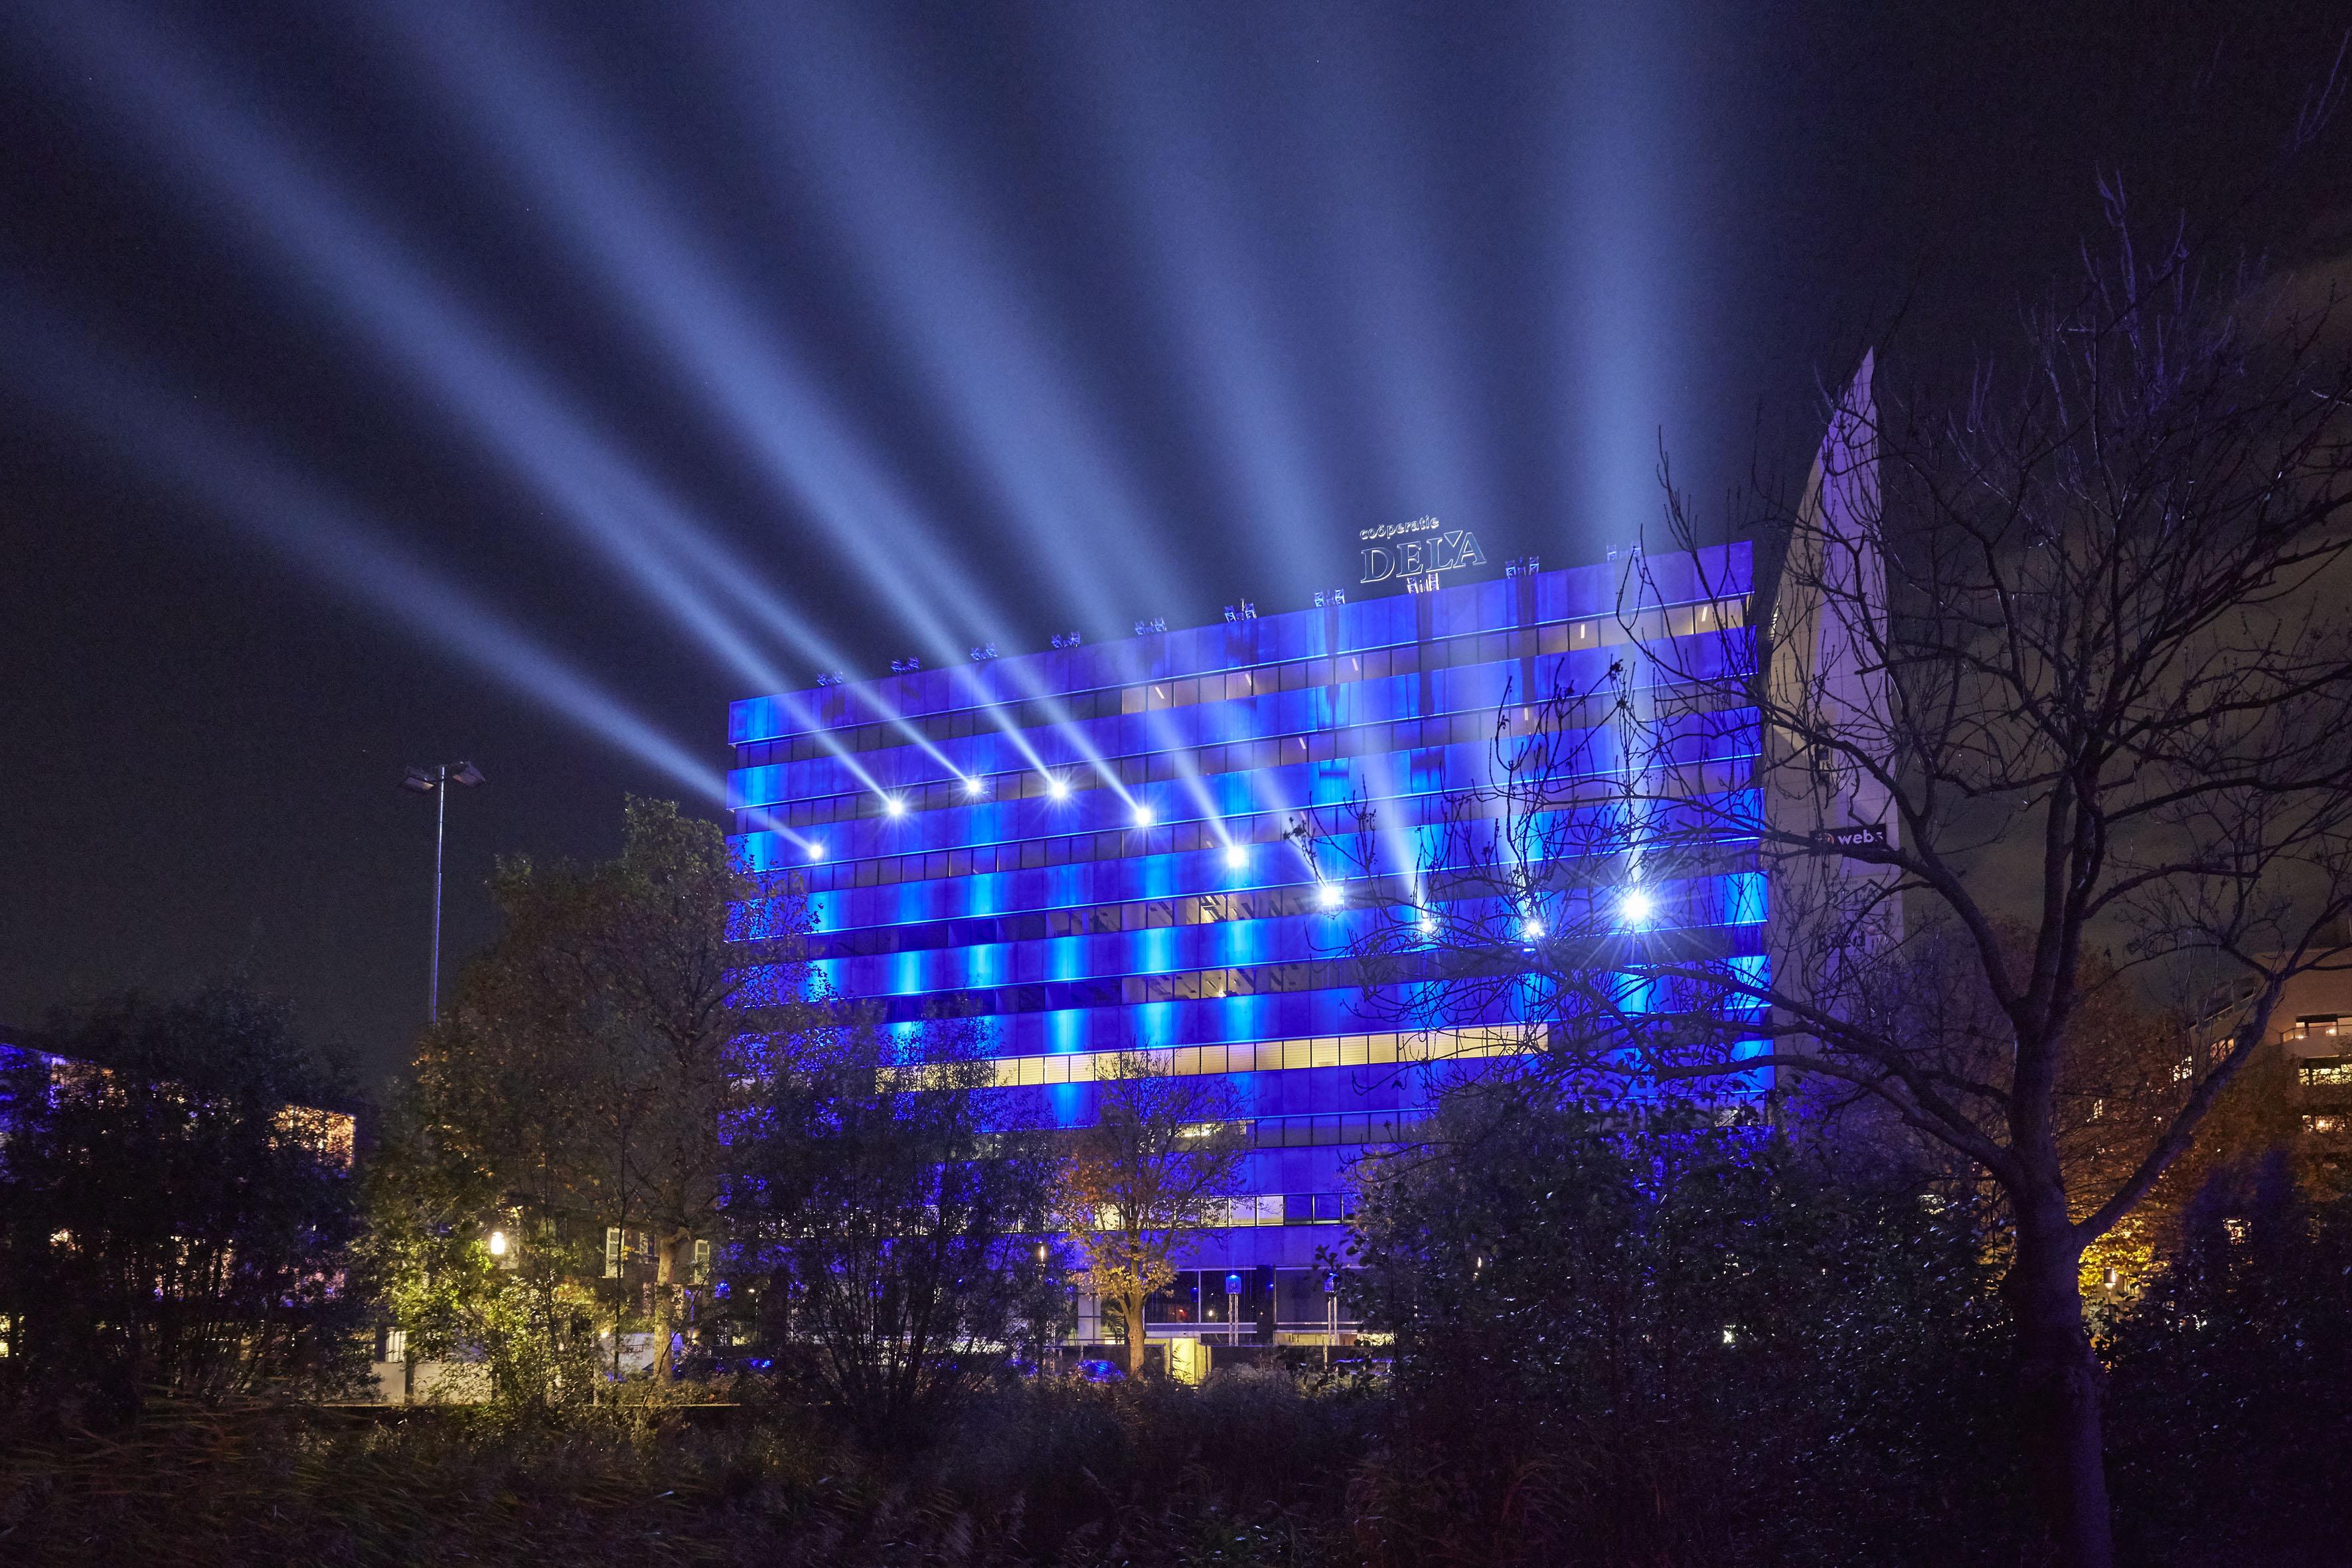 GLOW 2014 DELA-building Michael Suk; Statemachine © Claus Langer